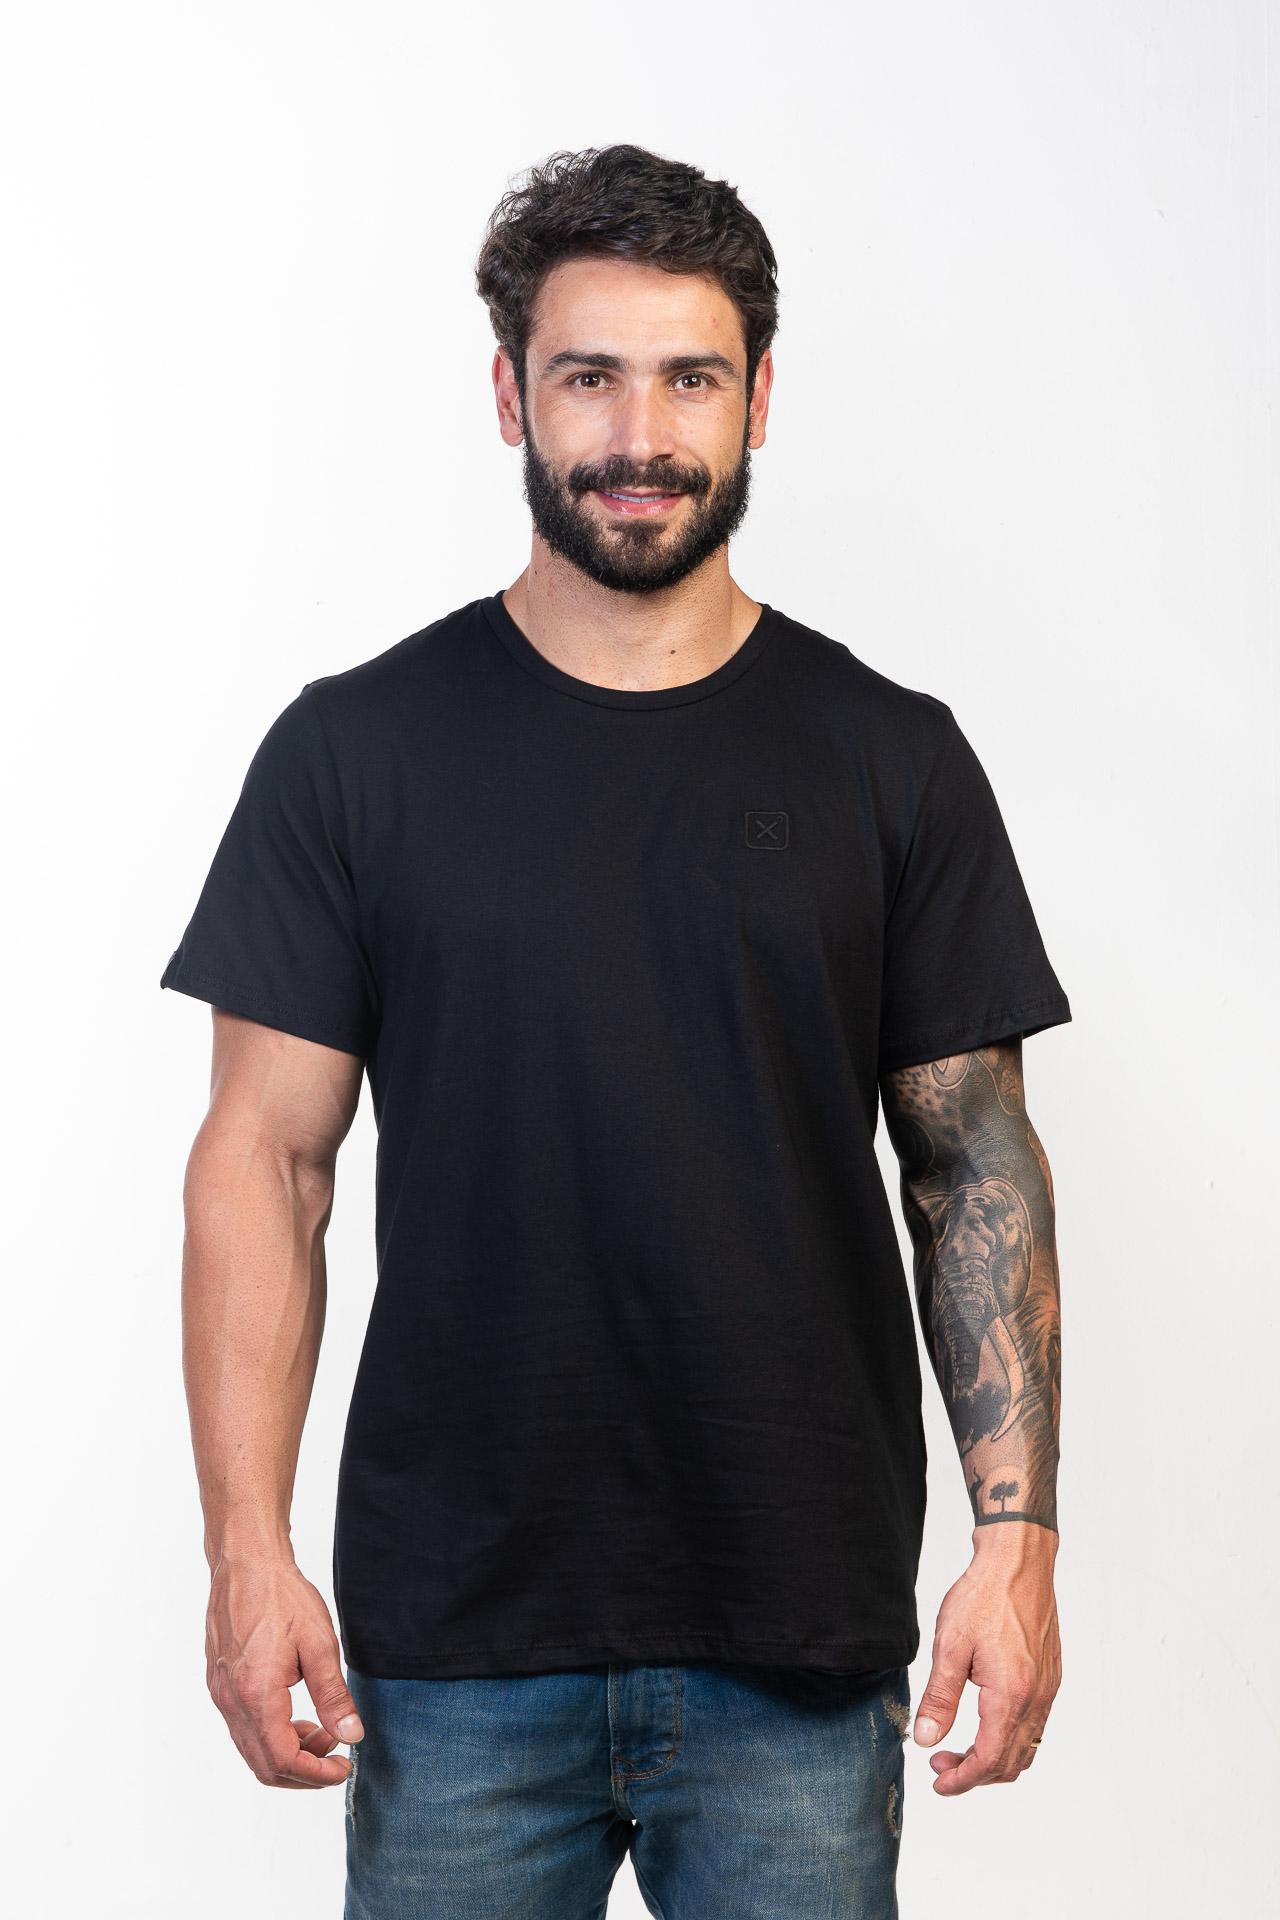 Camiseta Masculina TXC 19491